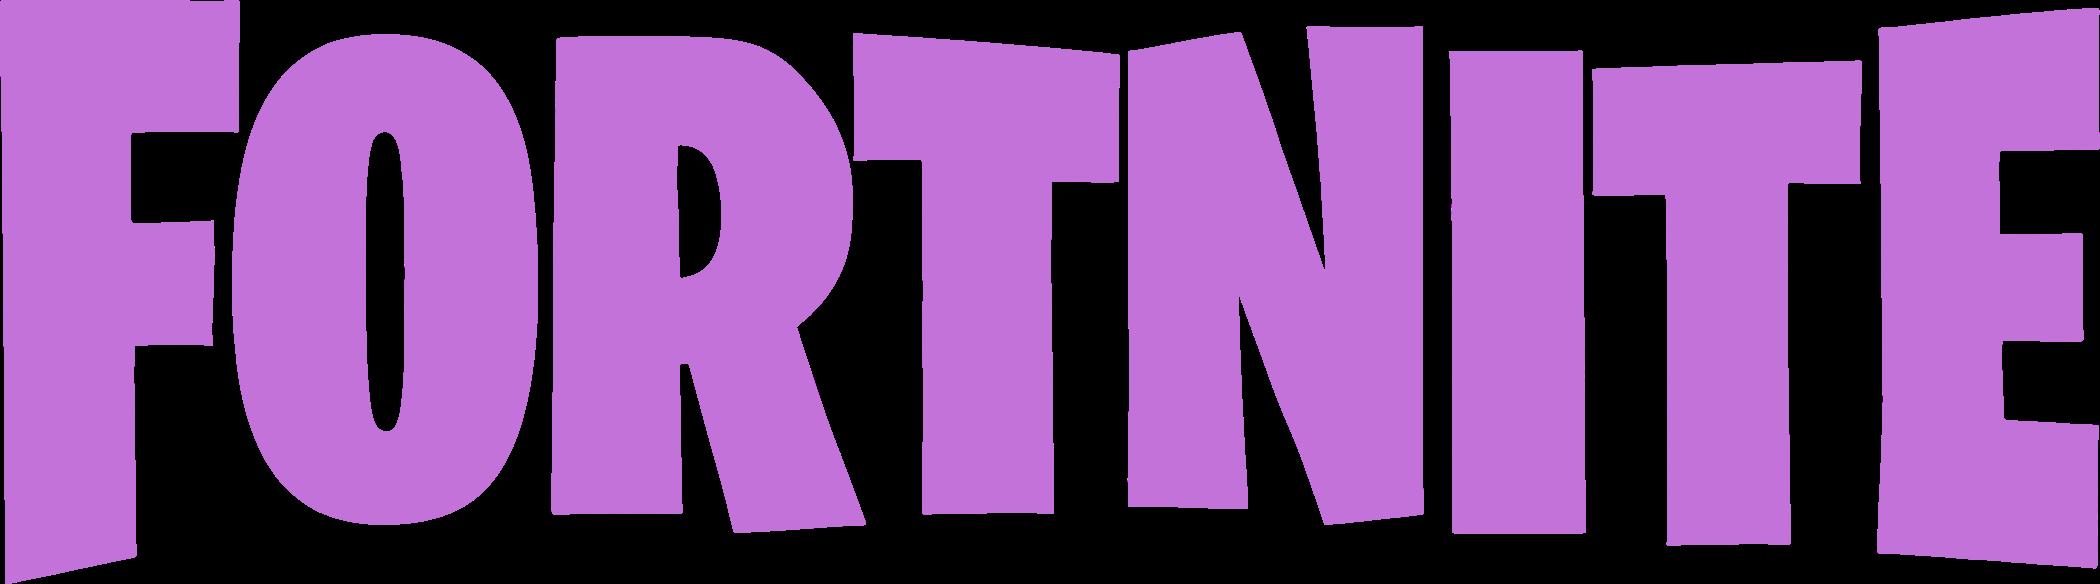 Fortnite PNG Transparent Images | PNG All